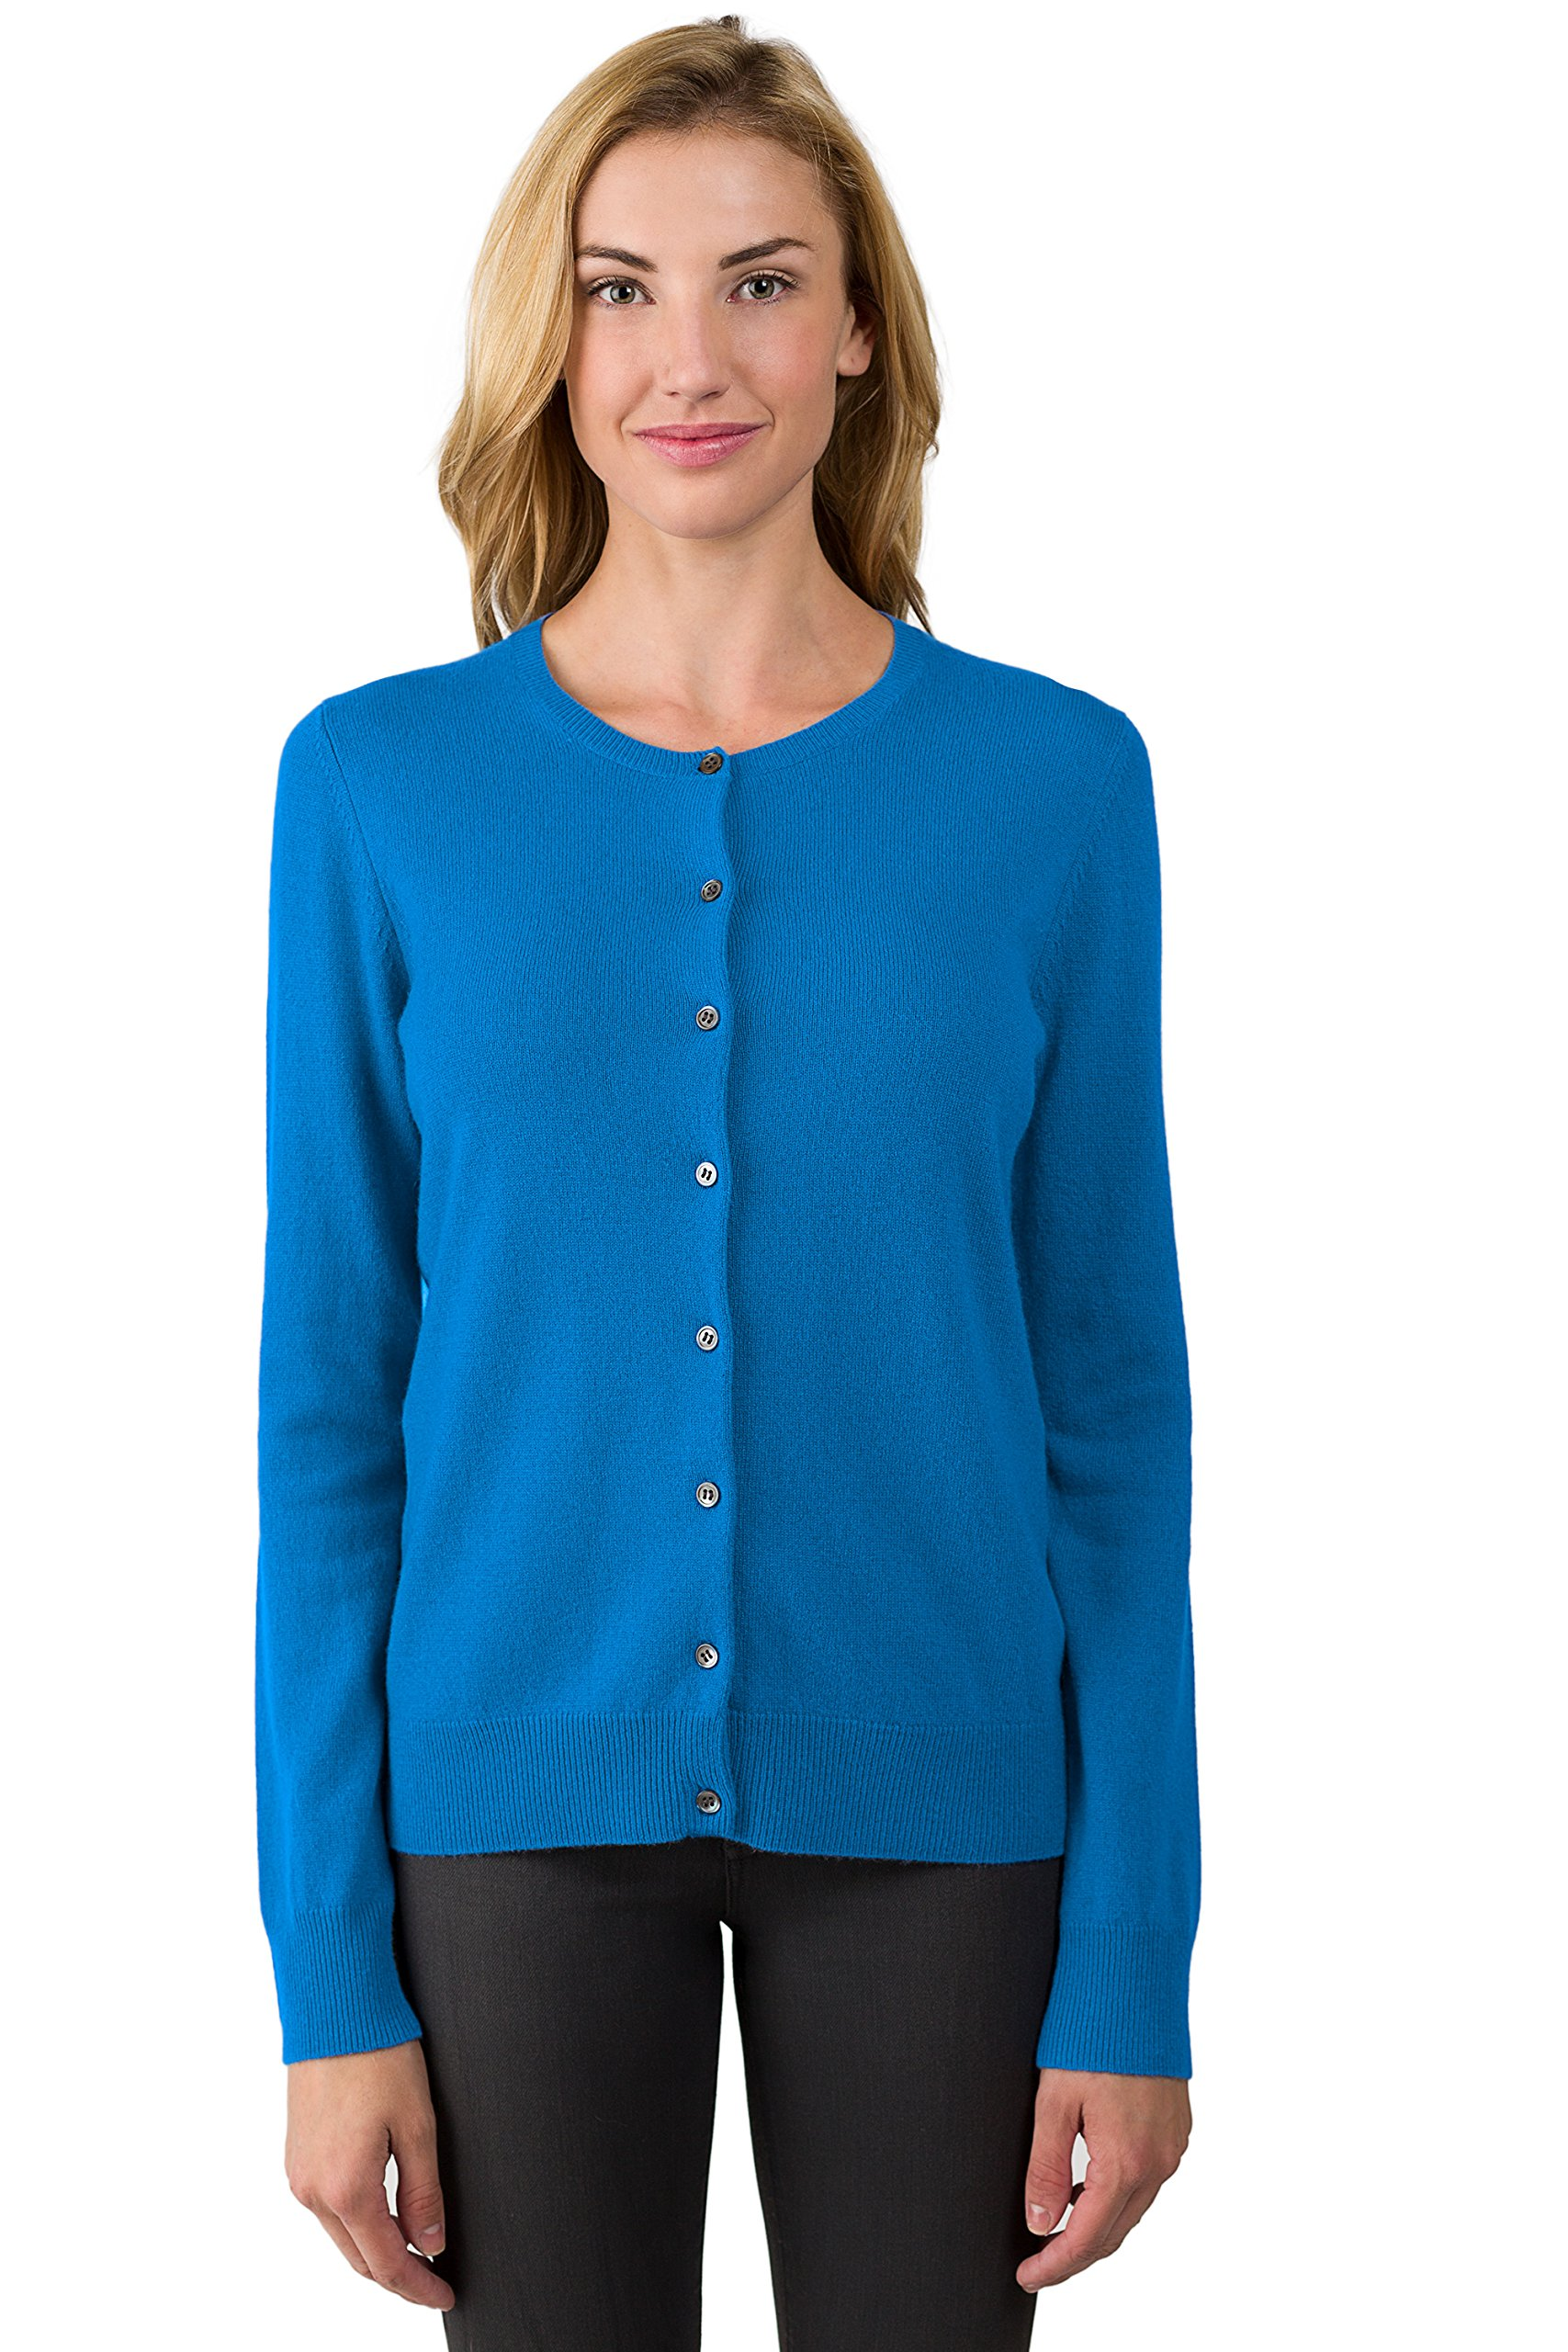 JENNIE LIU Women's 100% Cashmere Button Front Long Sleeve Crewneck Cardigan Sweater (S, OceanBlue)